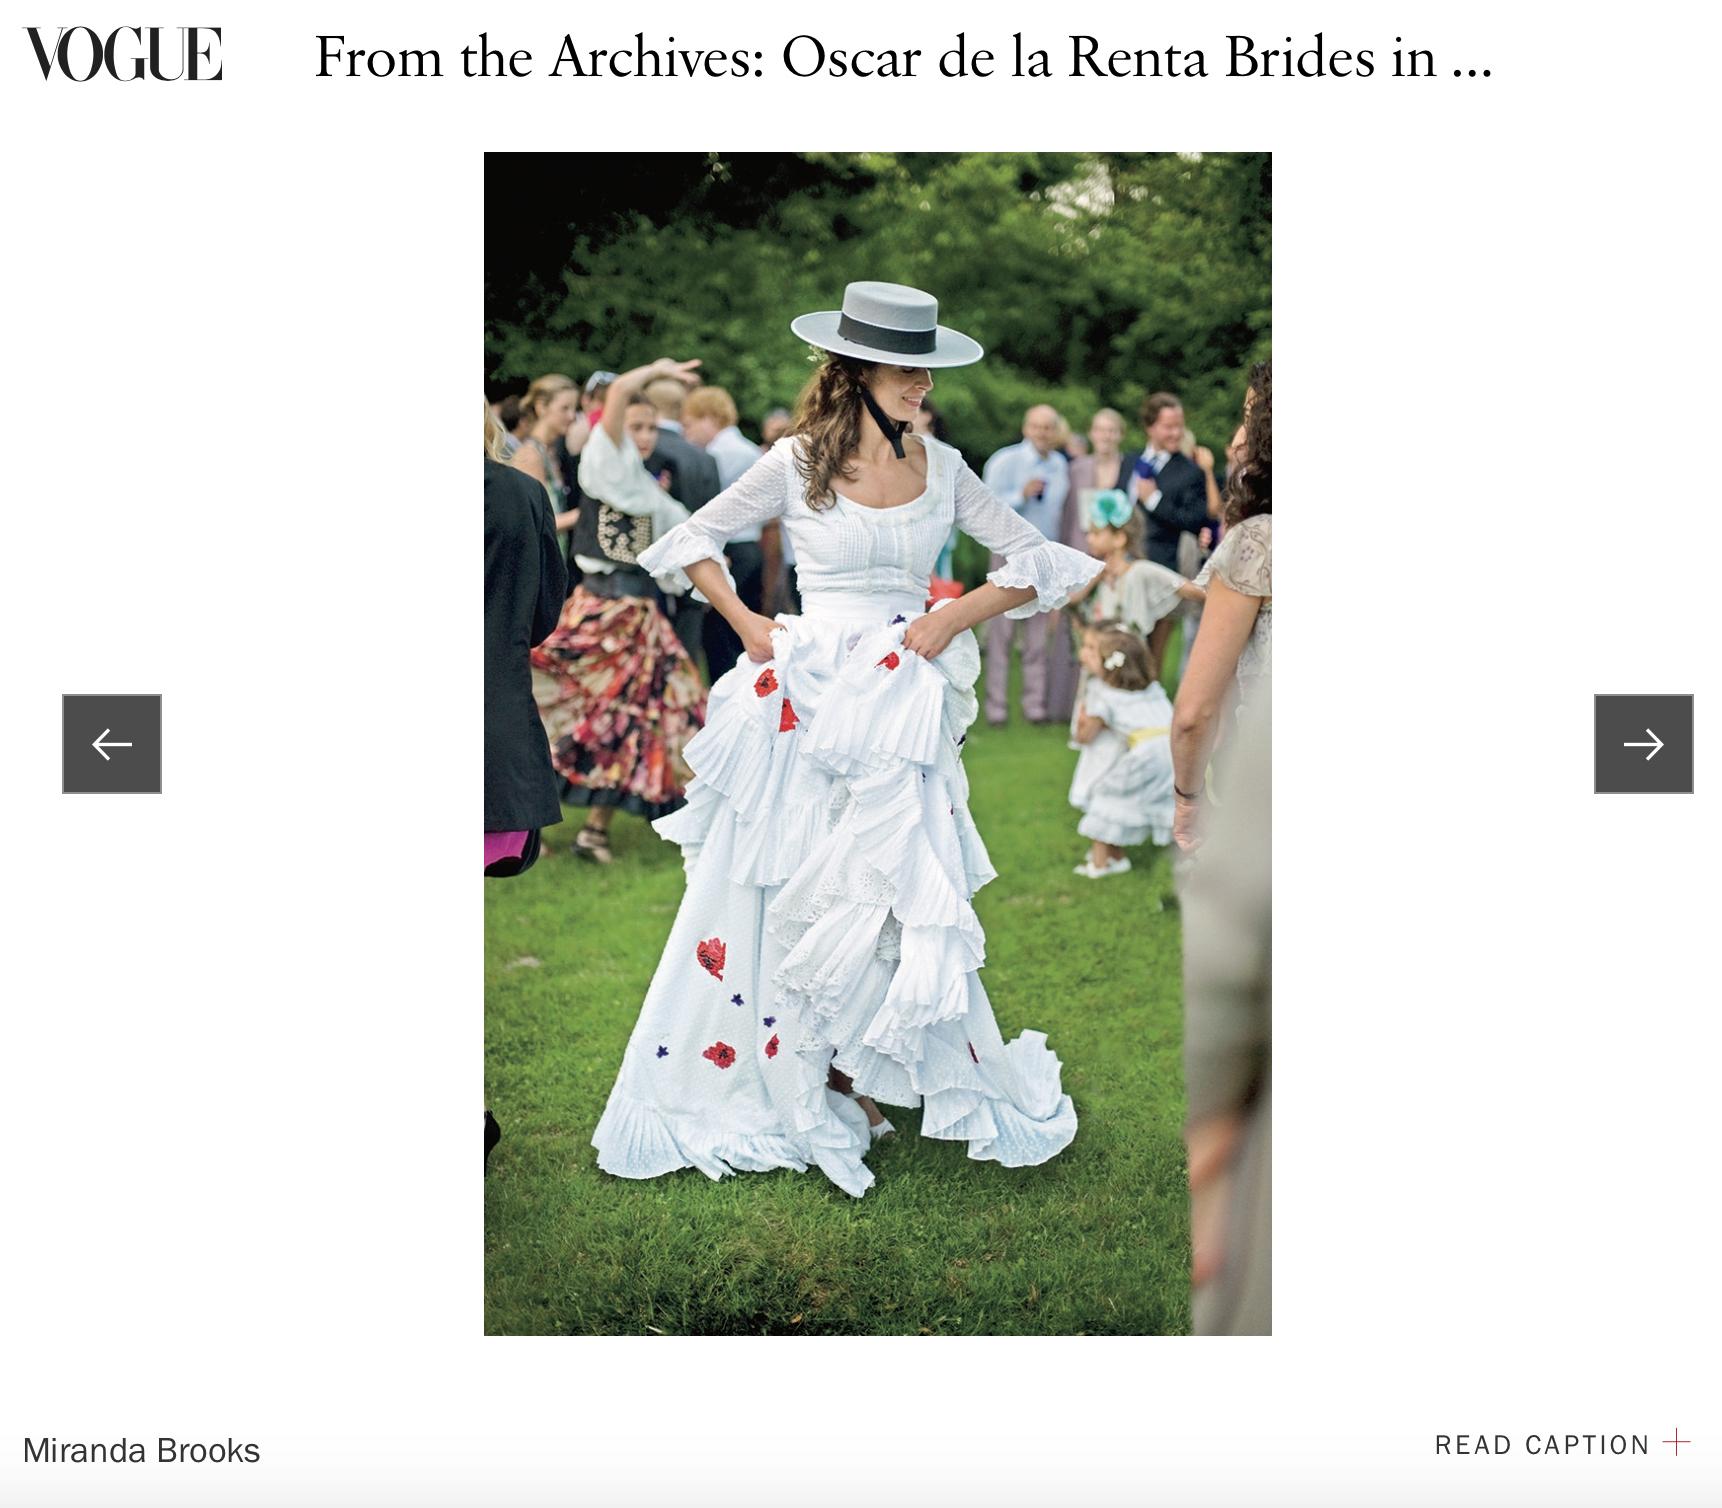 Miranda & Oscar - Our photos of Miranda Brooks wearing Oscar de la Renta appeared in the book